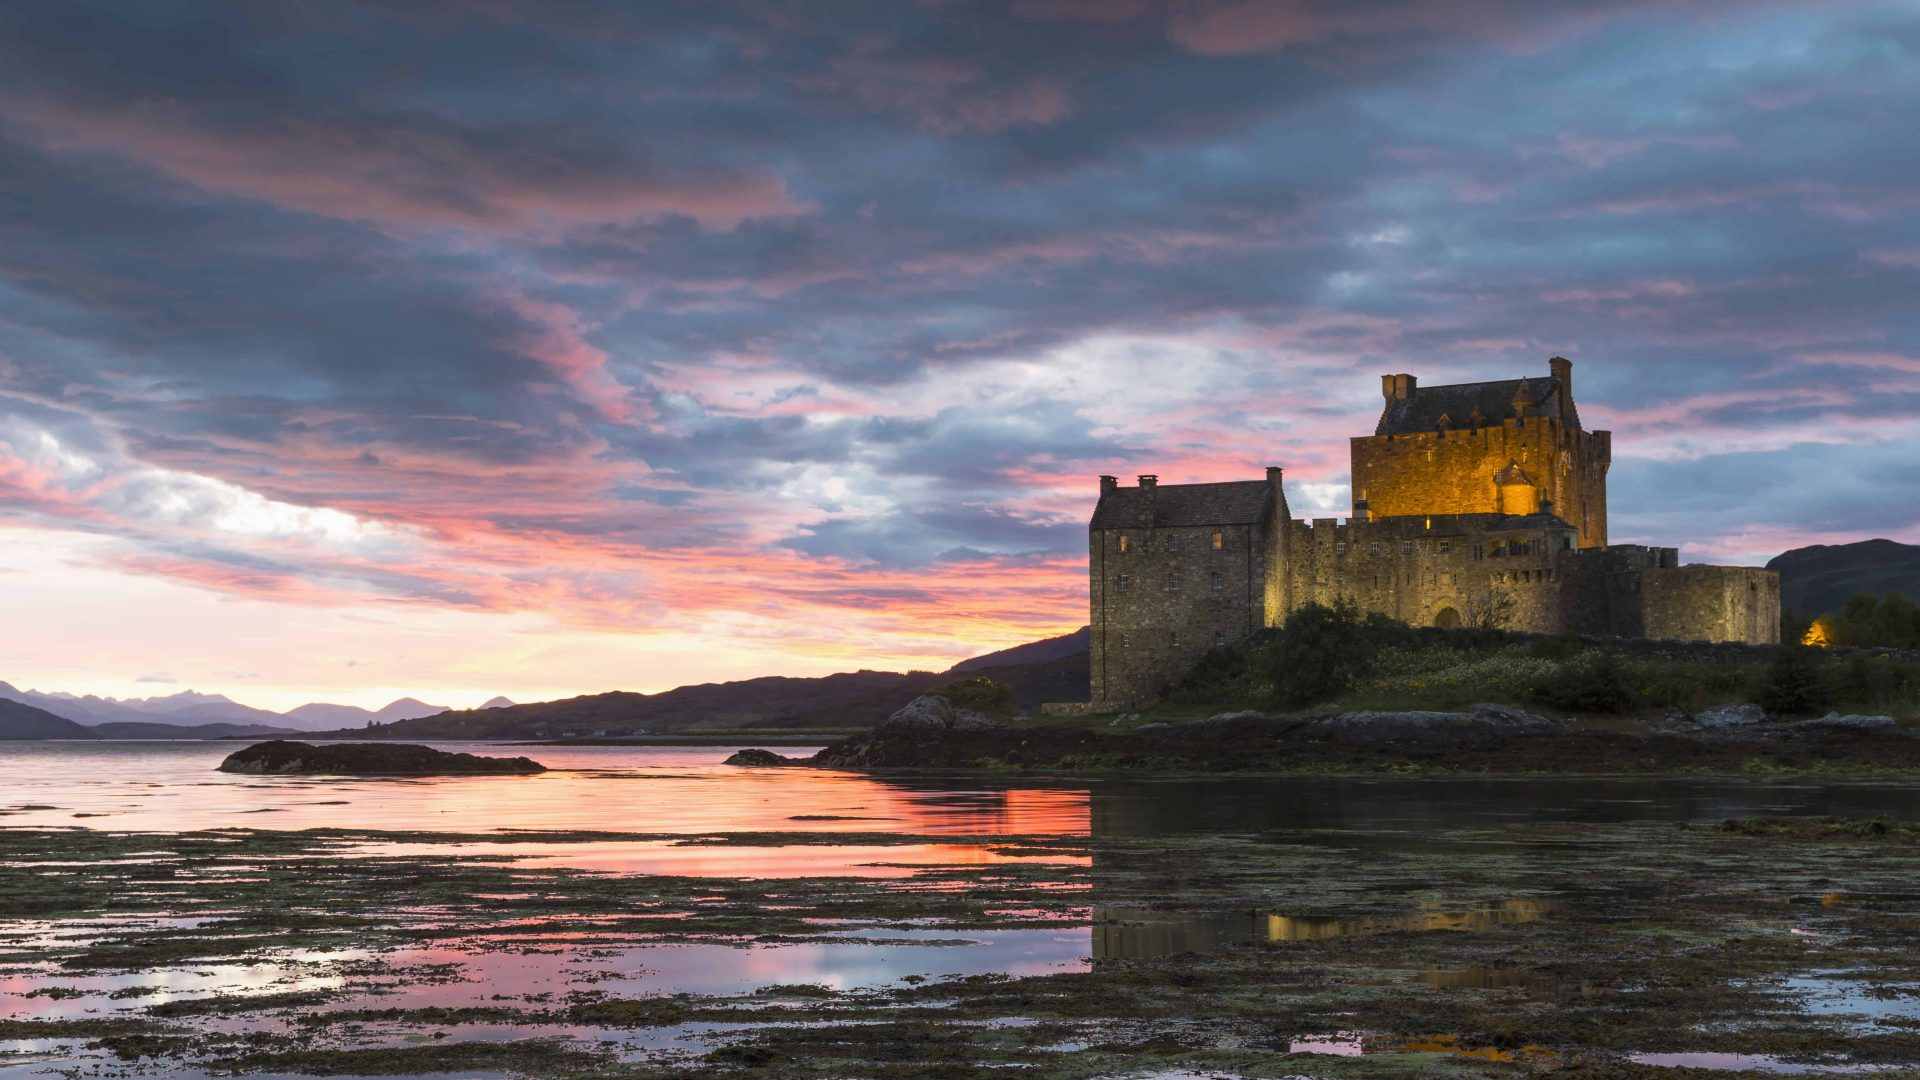 Eilean Donan Castle on Loch Duich at Dornie